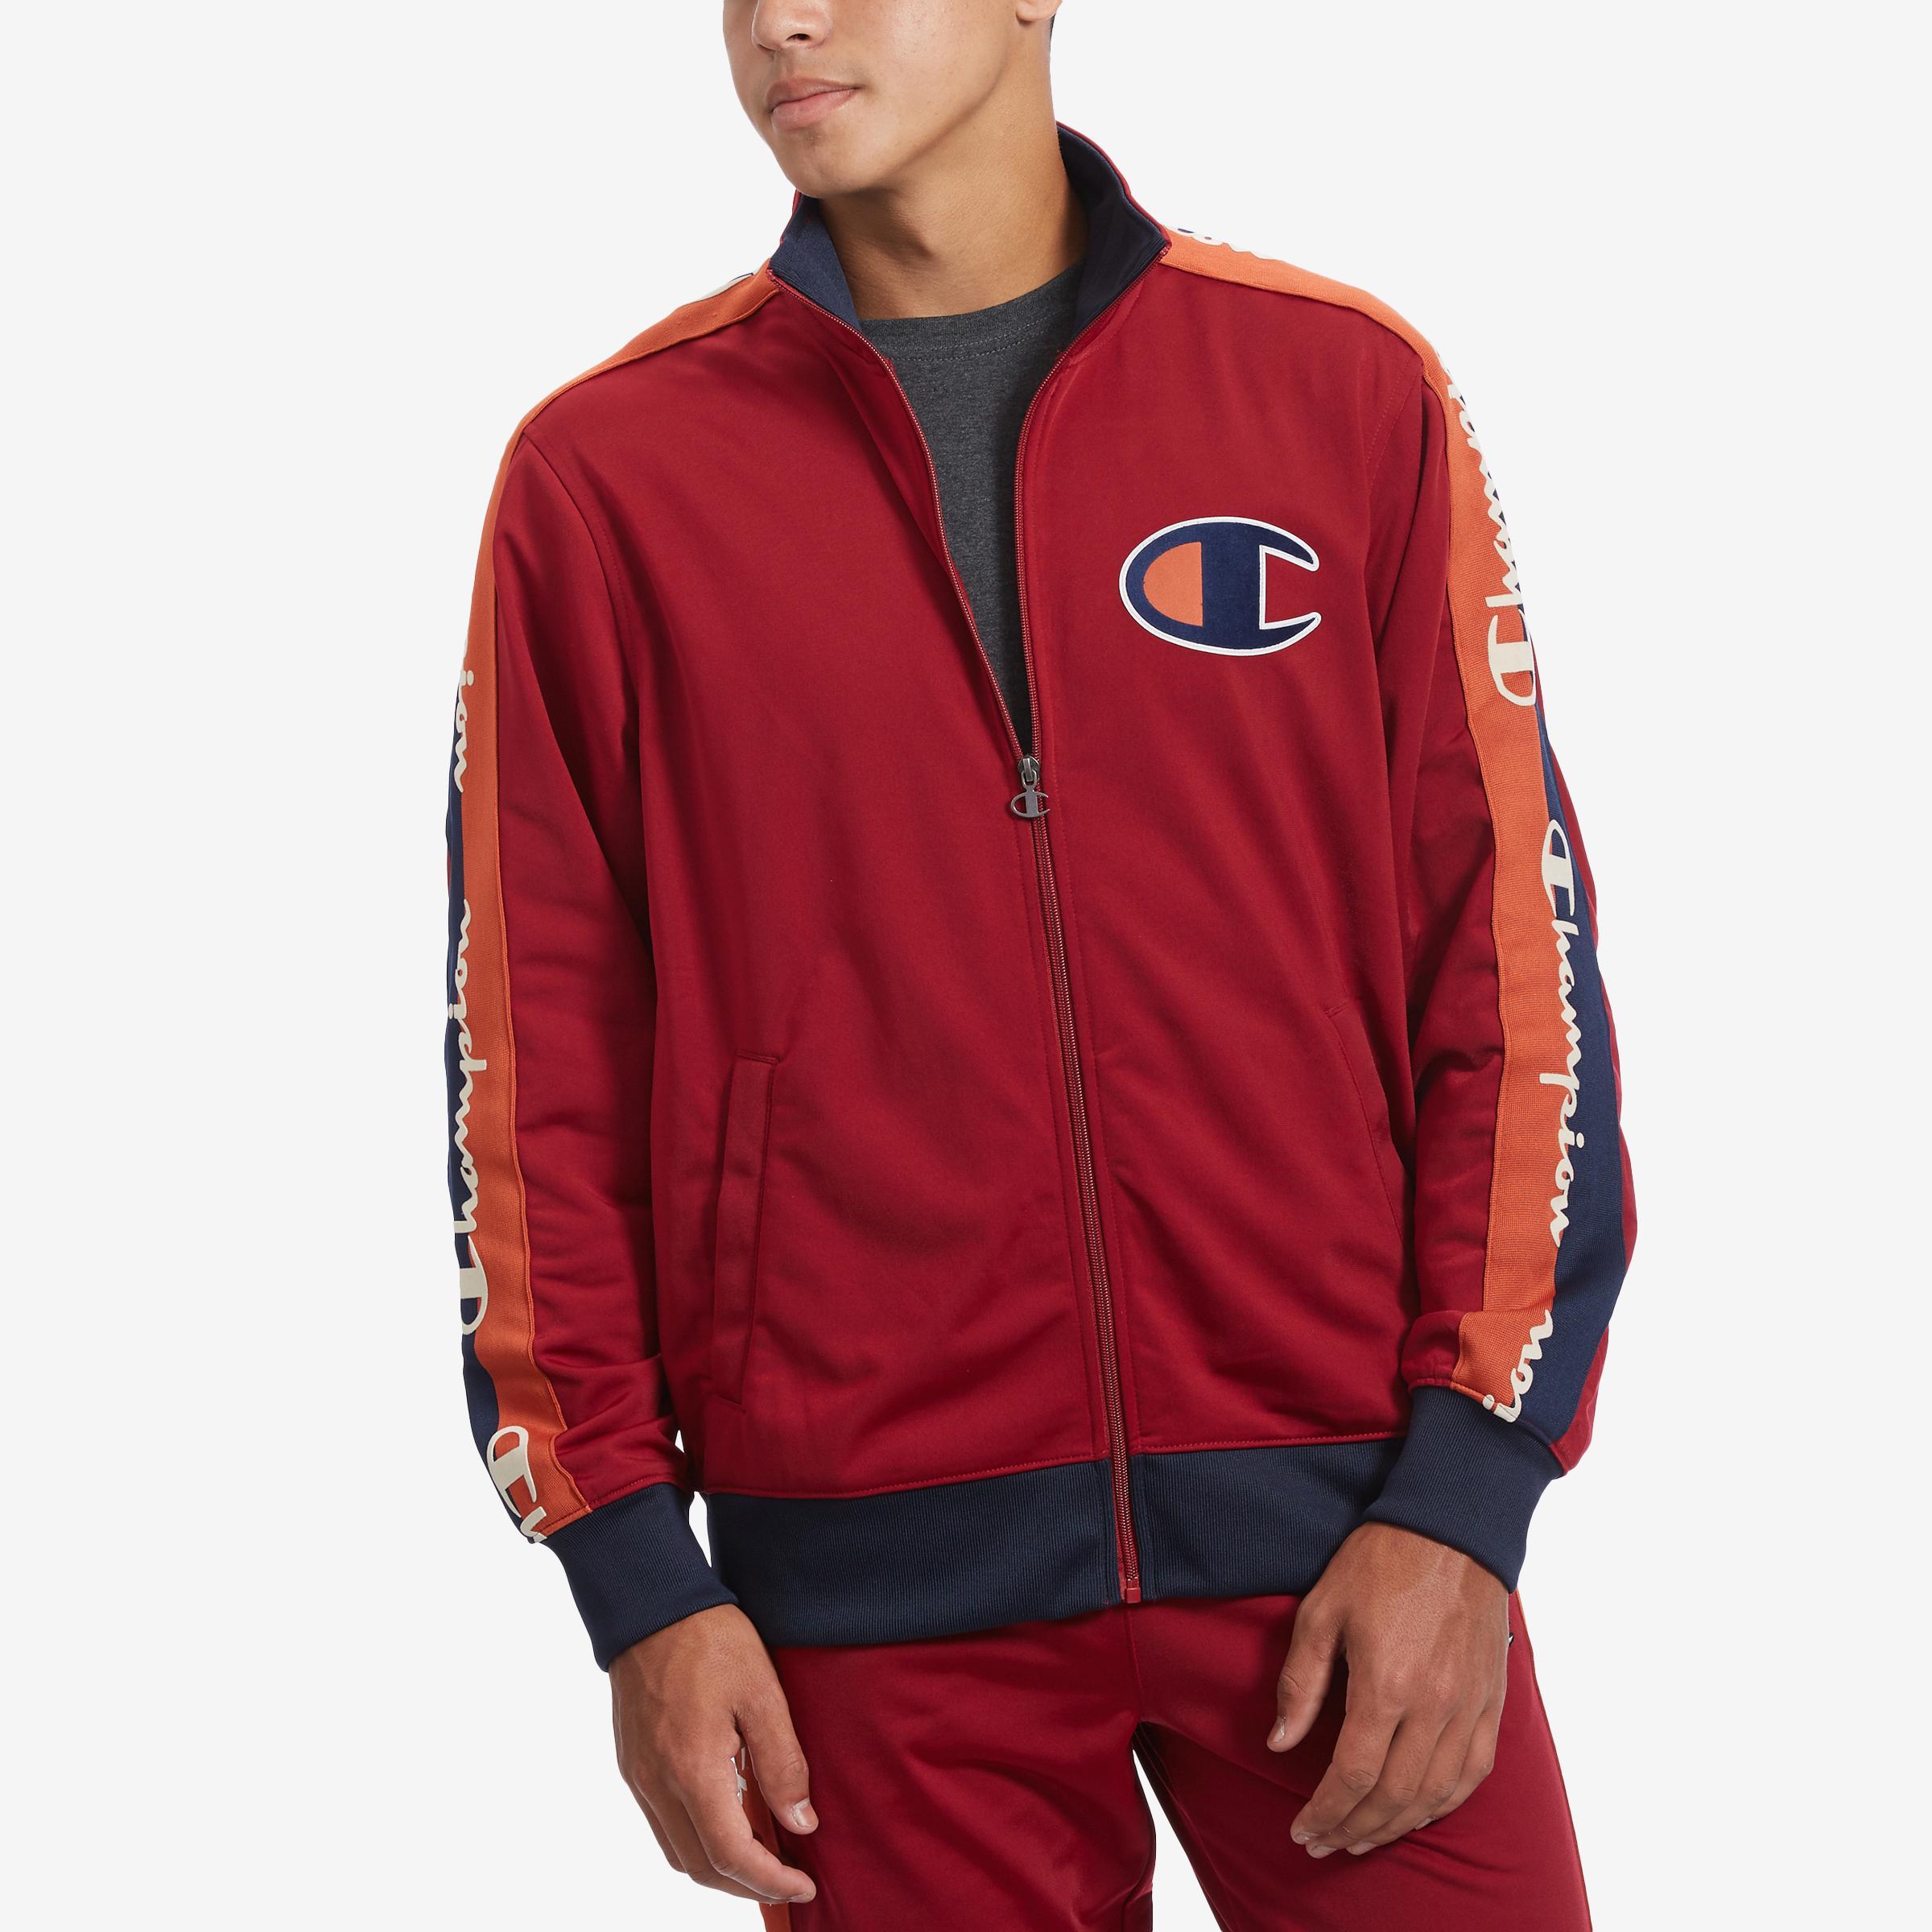 Men's Life Track Jacket, Chain Stitch Big C Logo